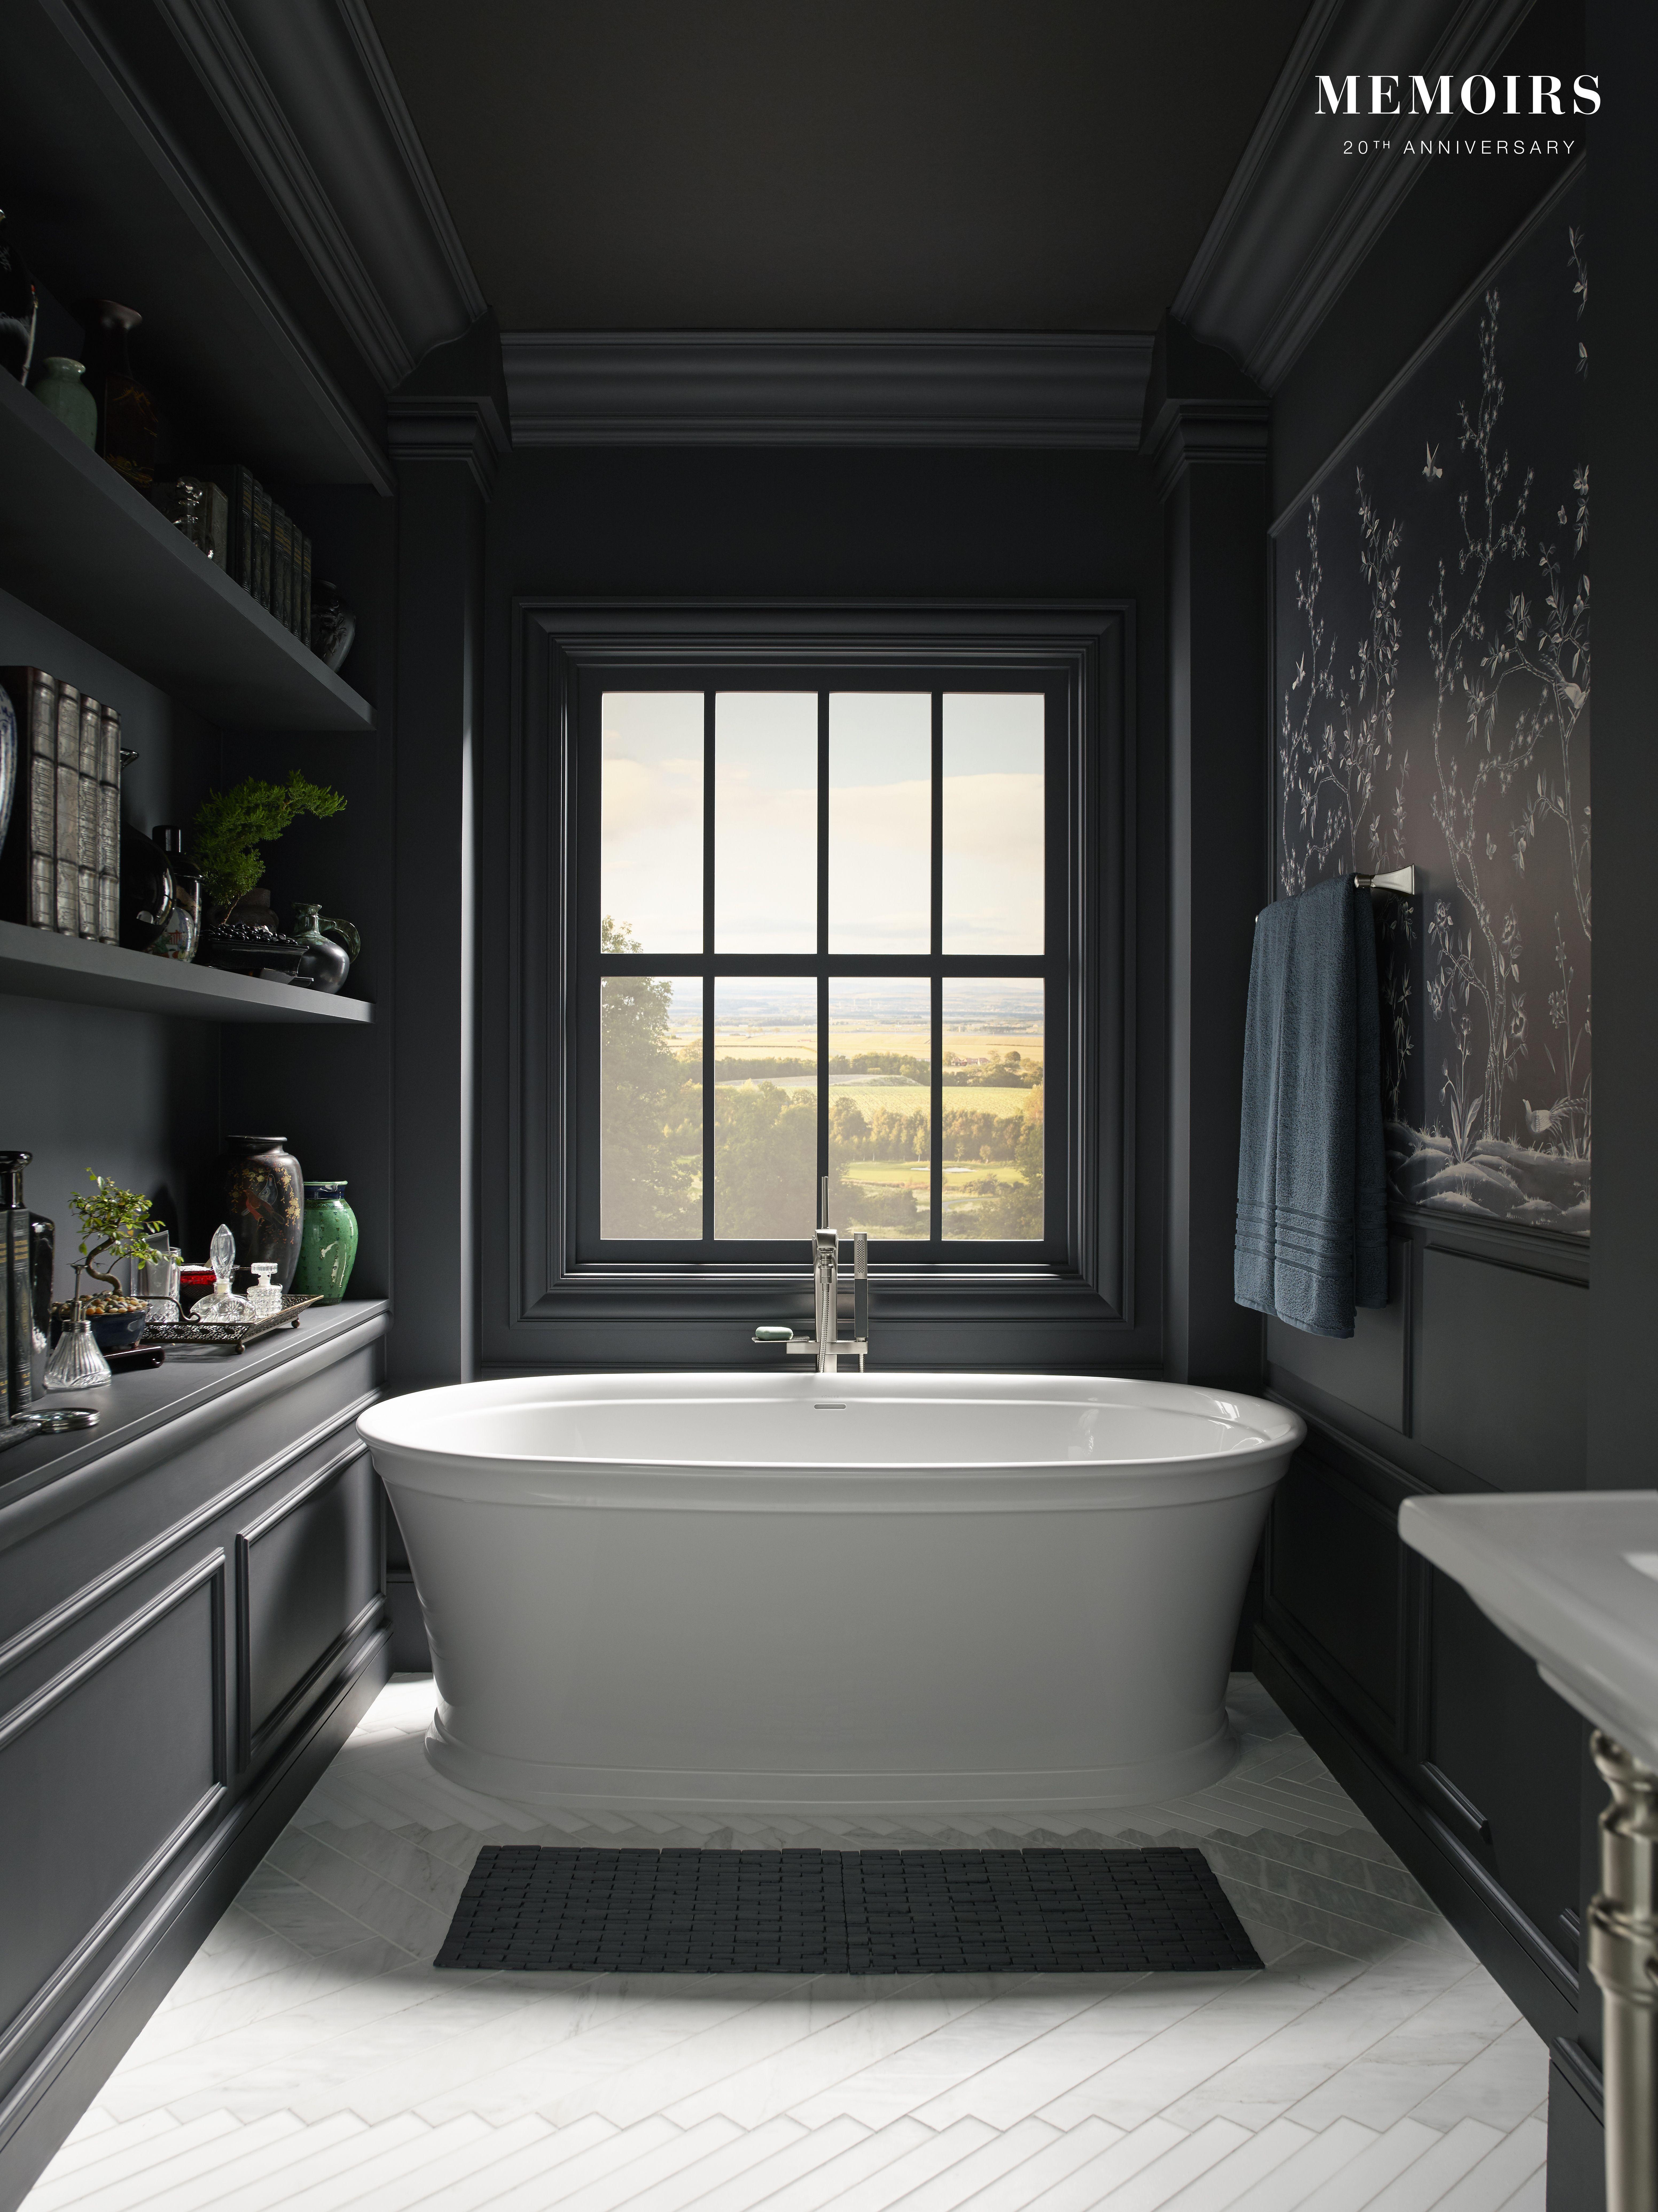 The Freestanding Design Of Kohler S Memoirs Freestanding Bath Tub Creates A Striking Focal Point In Your Bat Bathroom Design Free Standing Bath Modern Bathroom